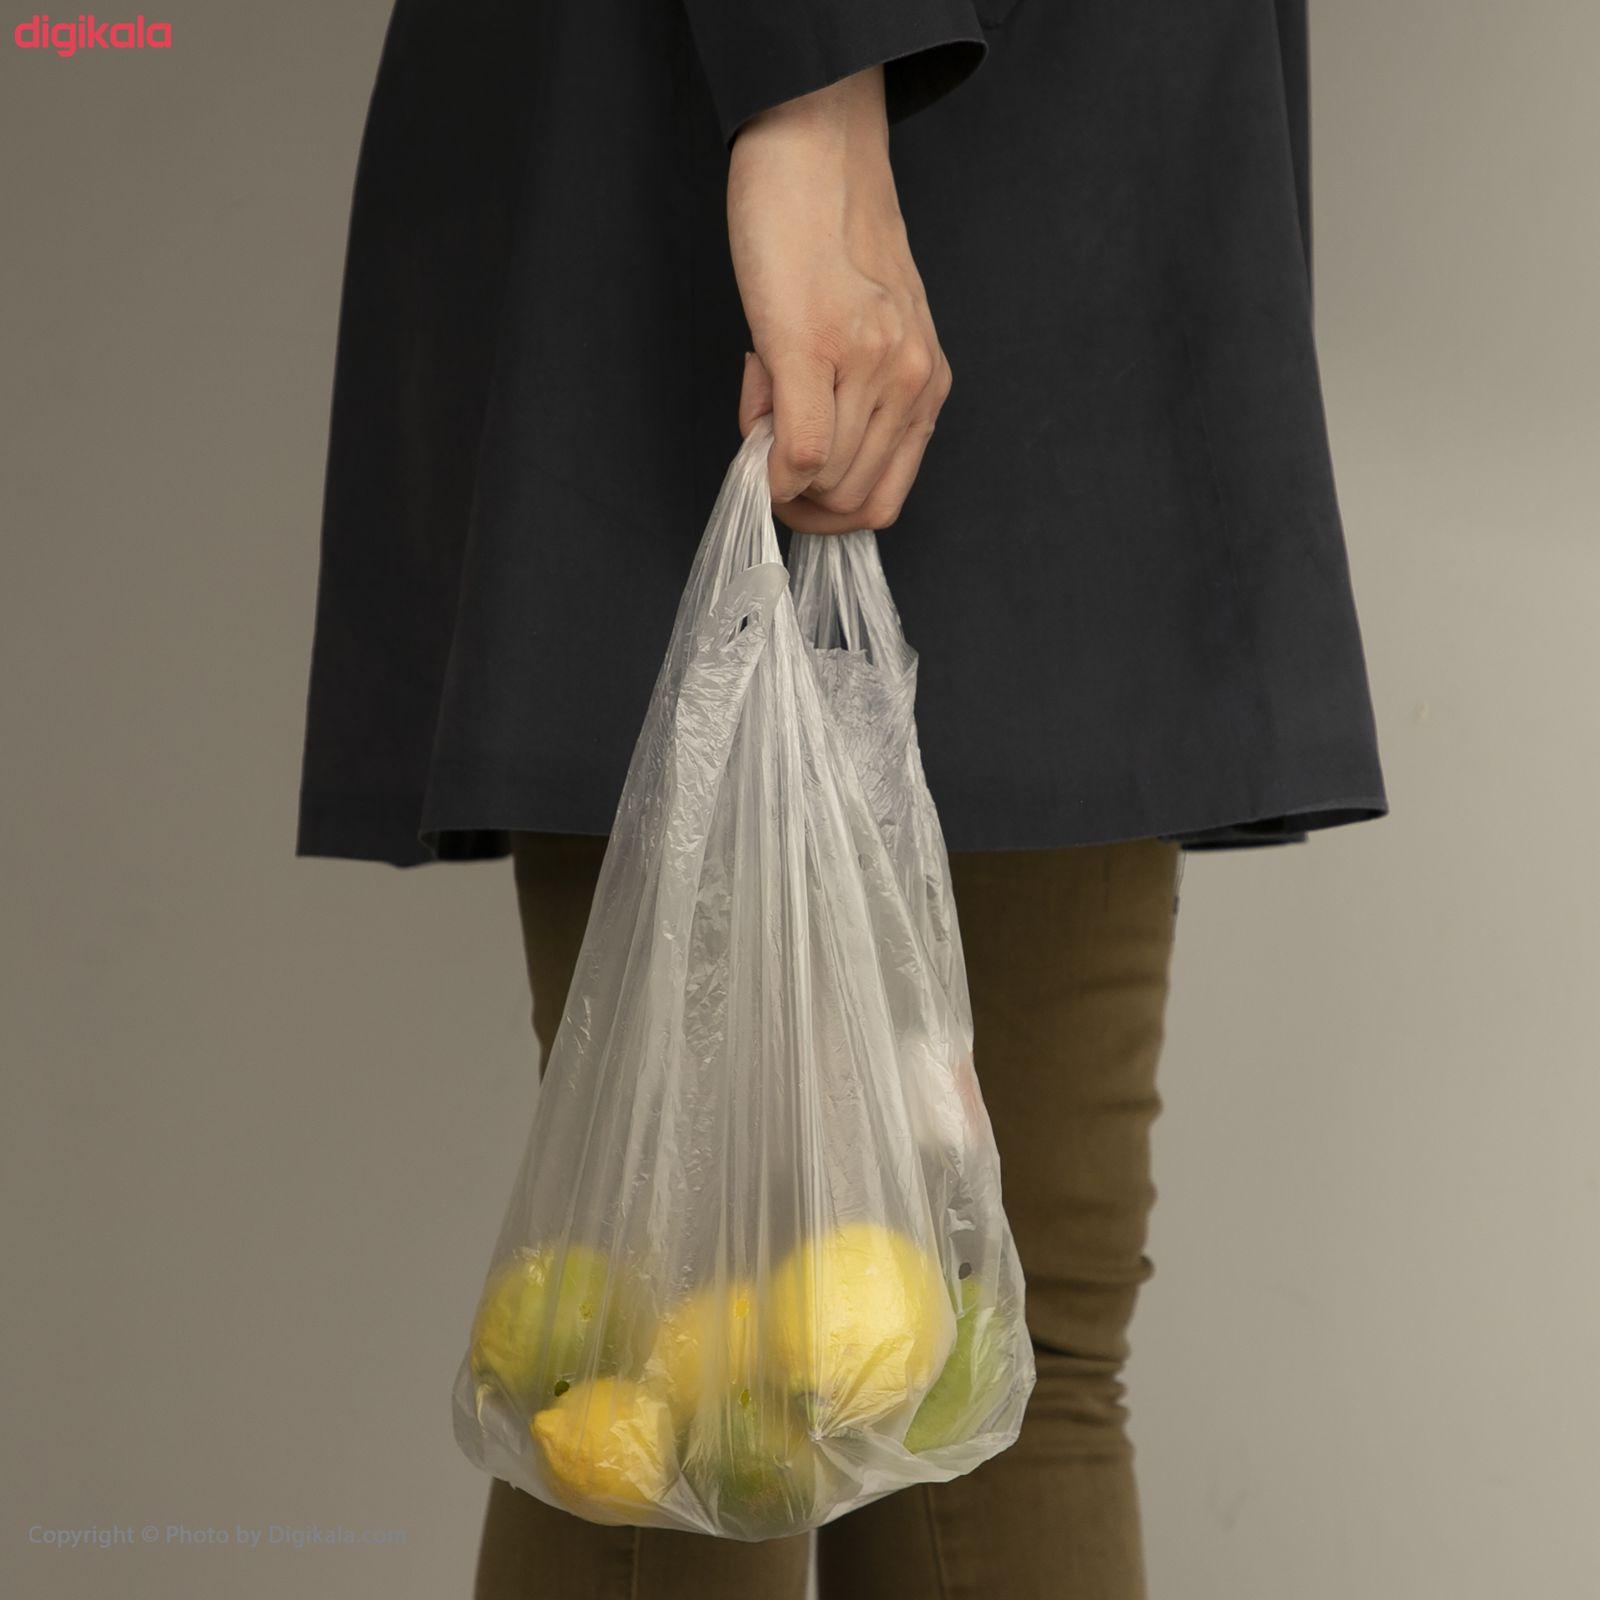 لیمو ترش سنگی فله - 500 گرم main 1 4